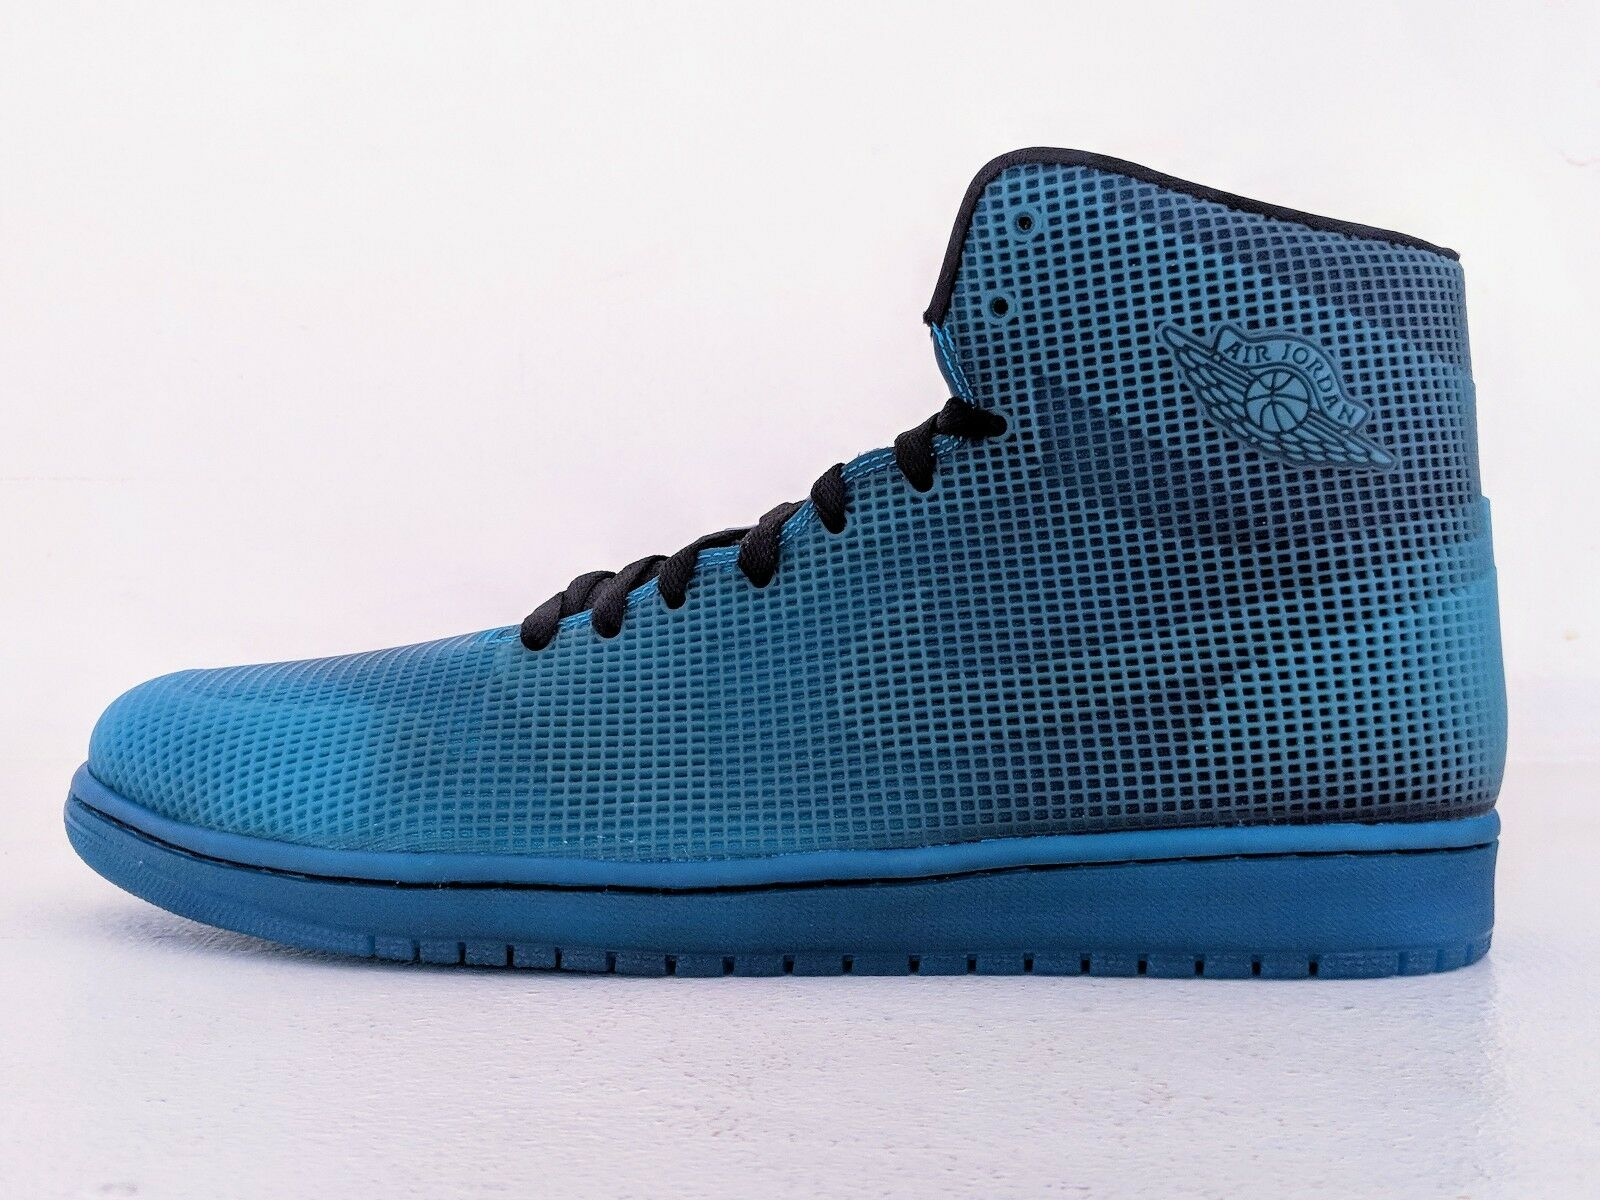 Nike Air Jordan Retro 4LAB1 Sz 15 Tropical Teal 677690-020 Limited Classic DS QS